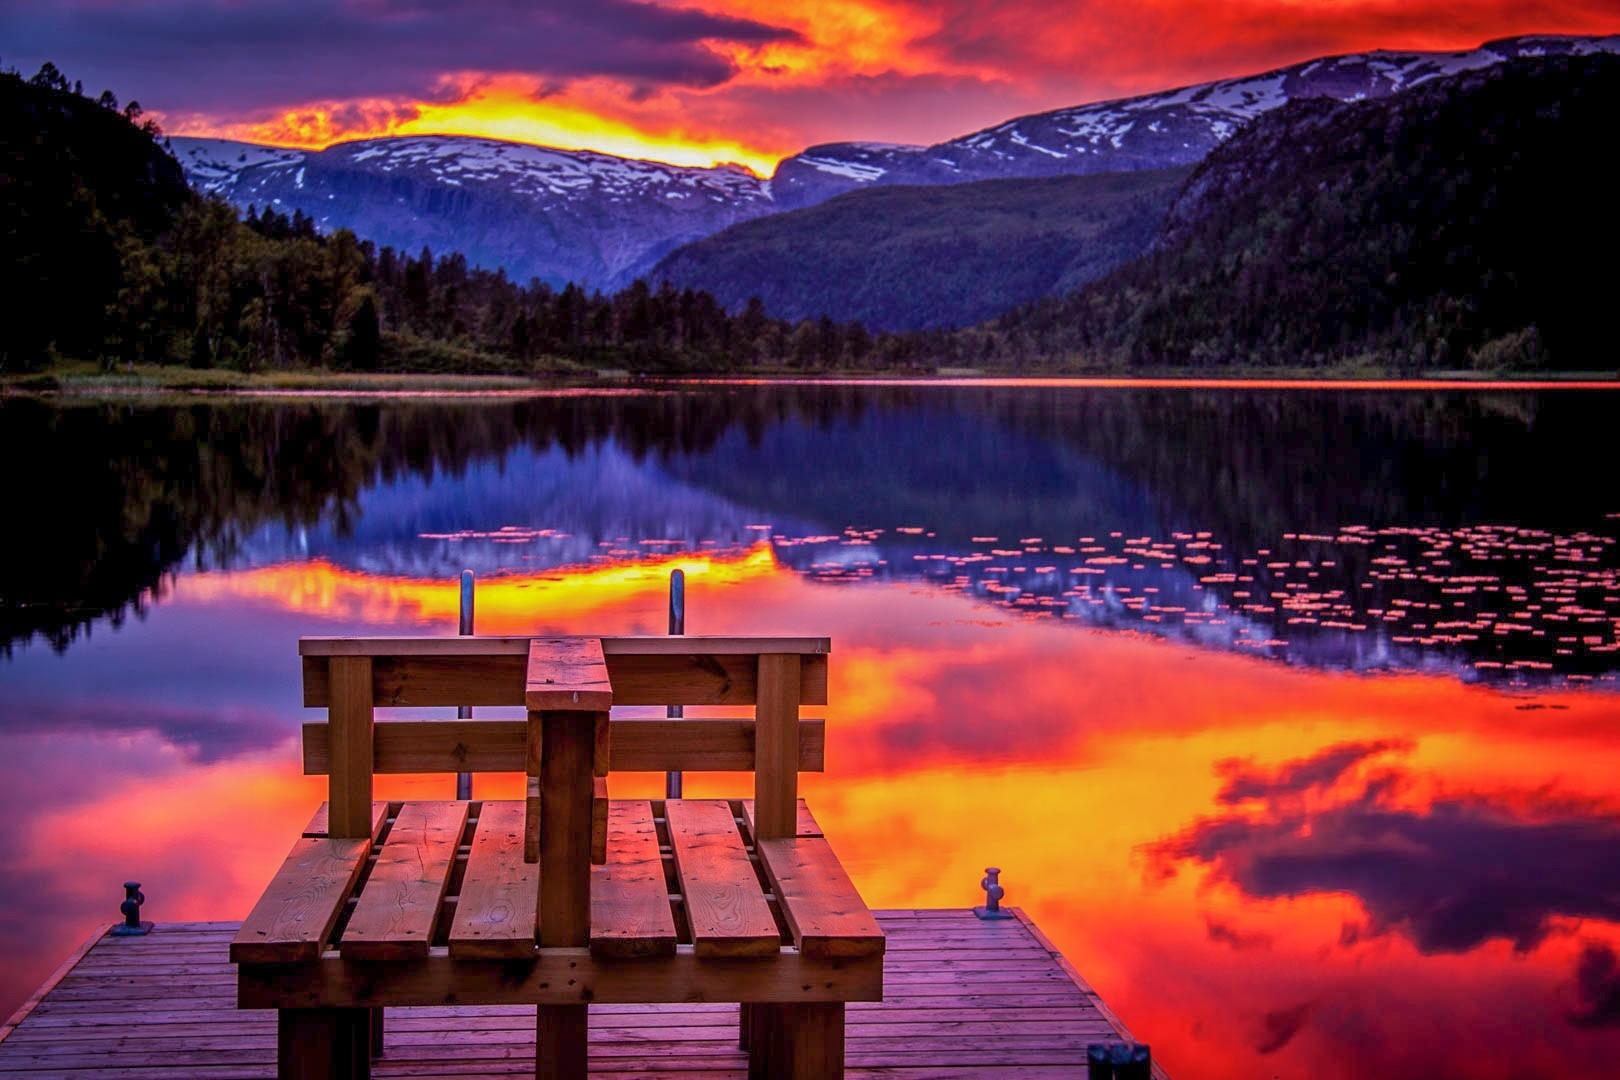 Art.nr 107 Solnedgang i juli, Langevatnet